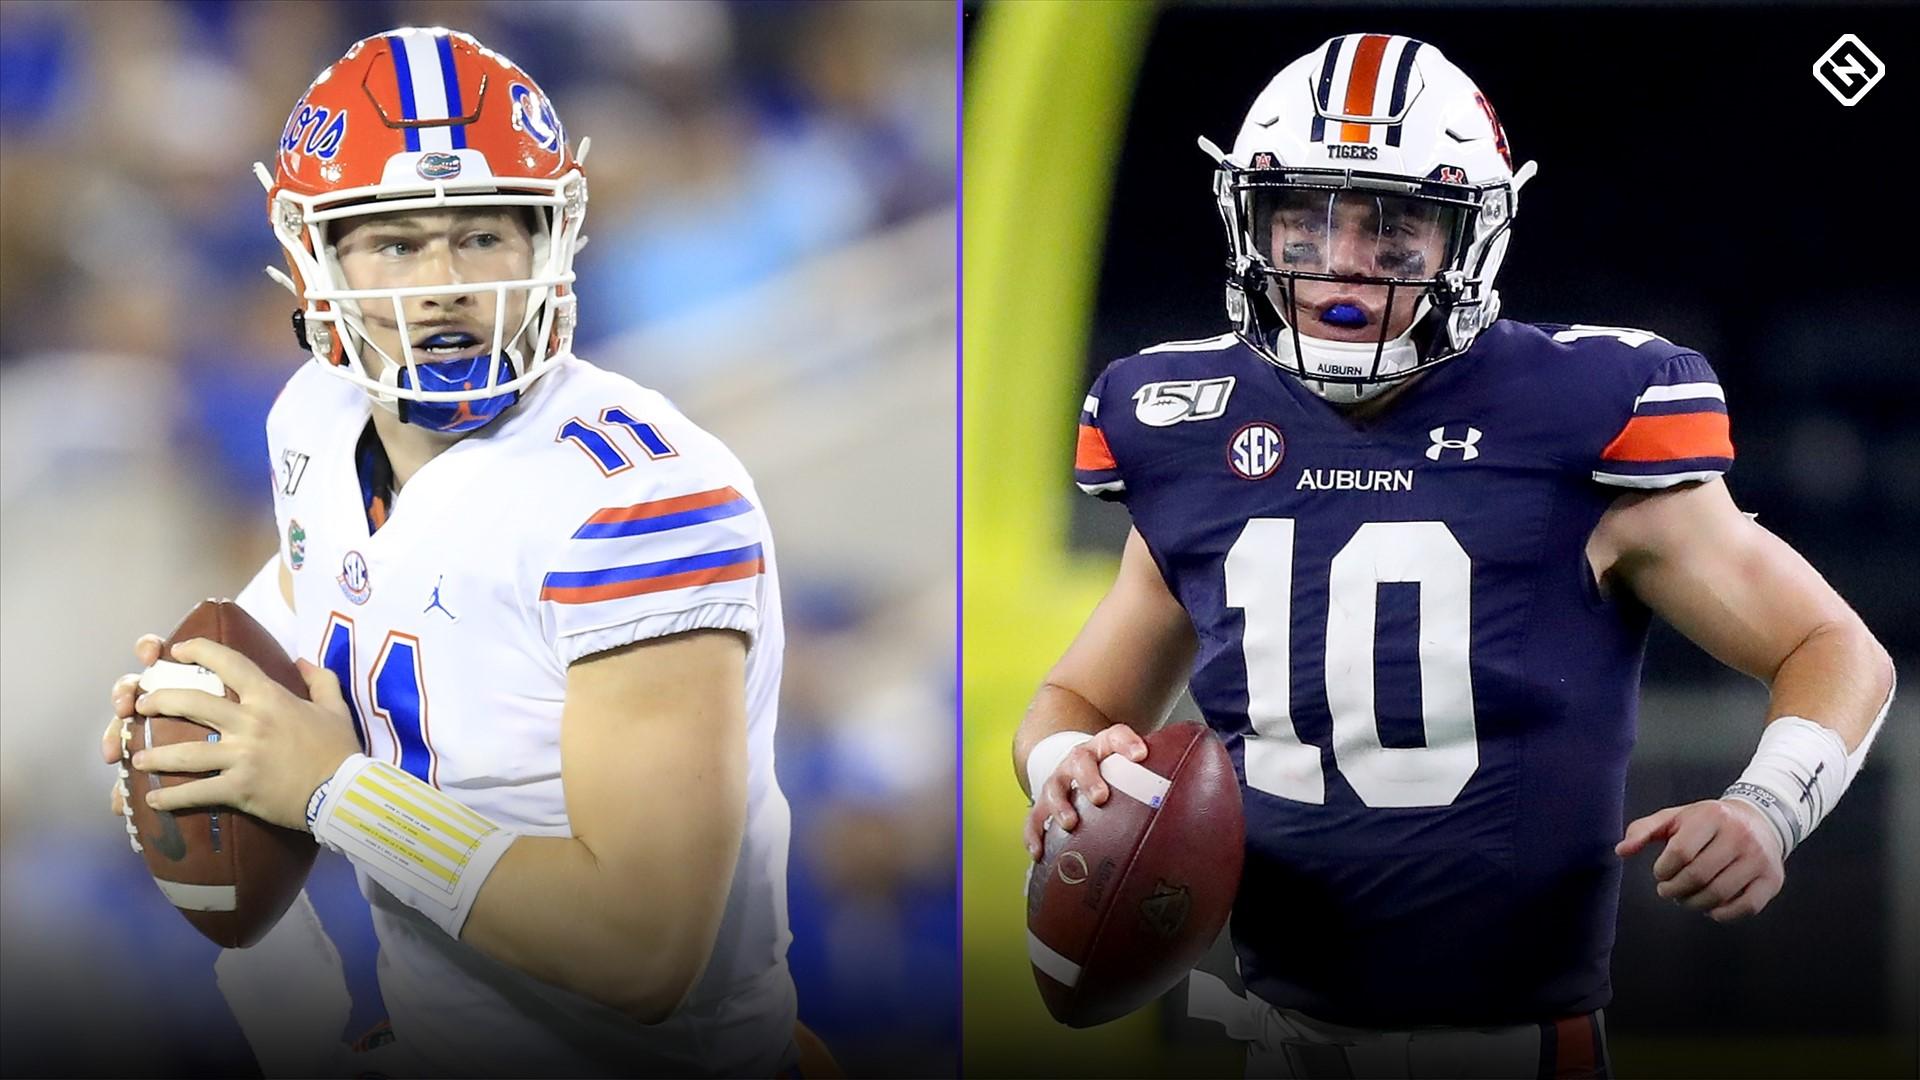 College football picks, Week 6: Auburn, Florida will flex defensive muscles in SEC showdown